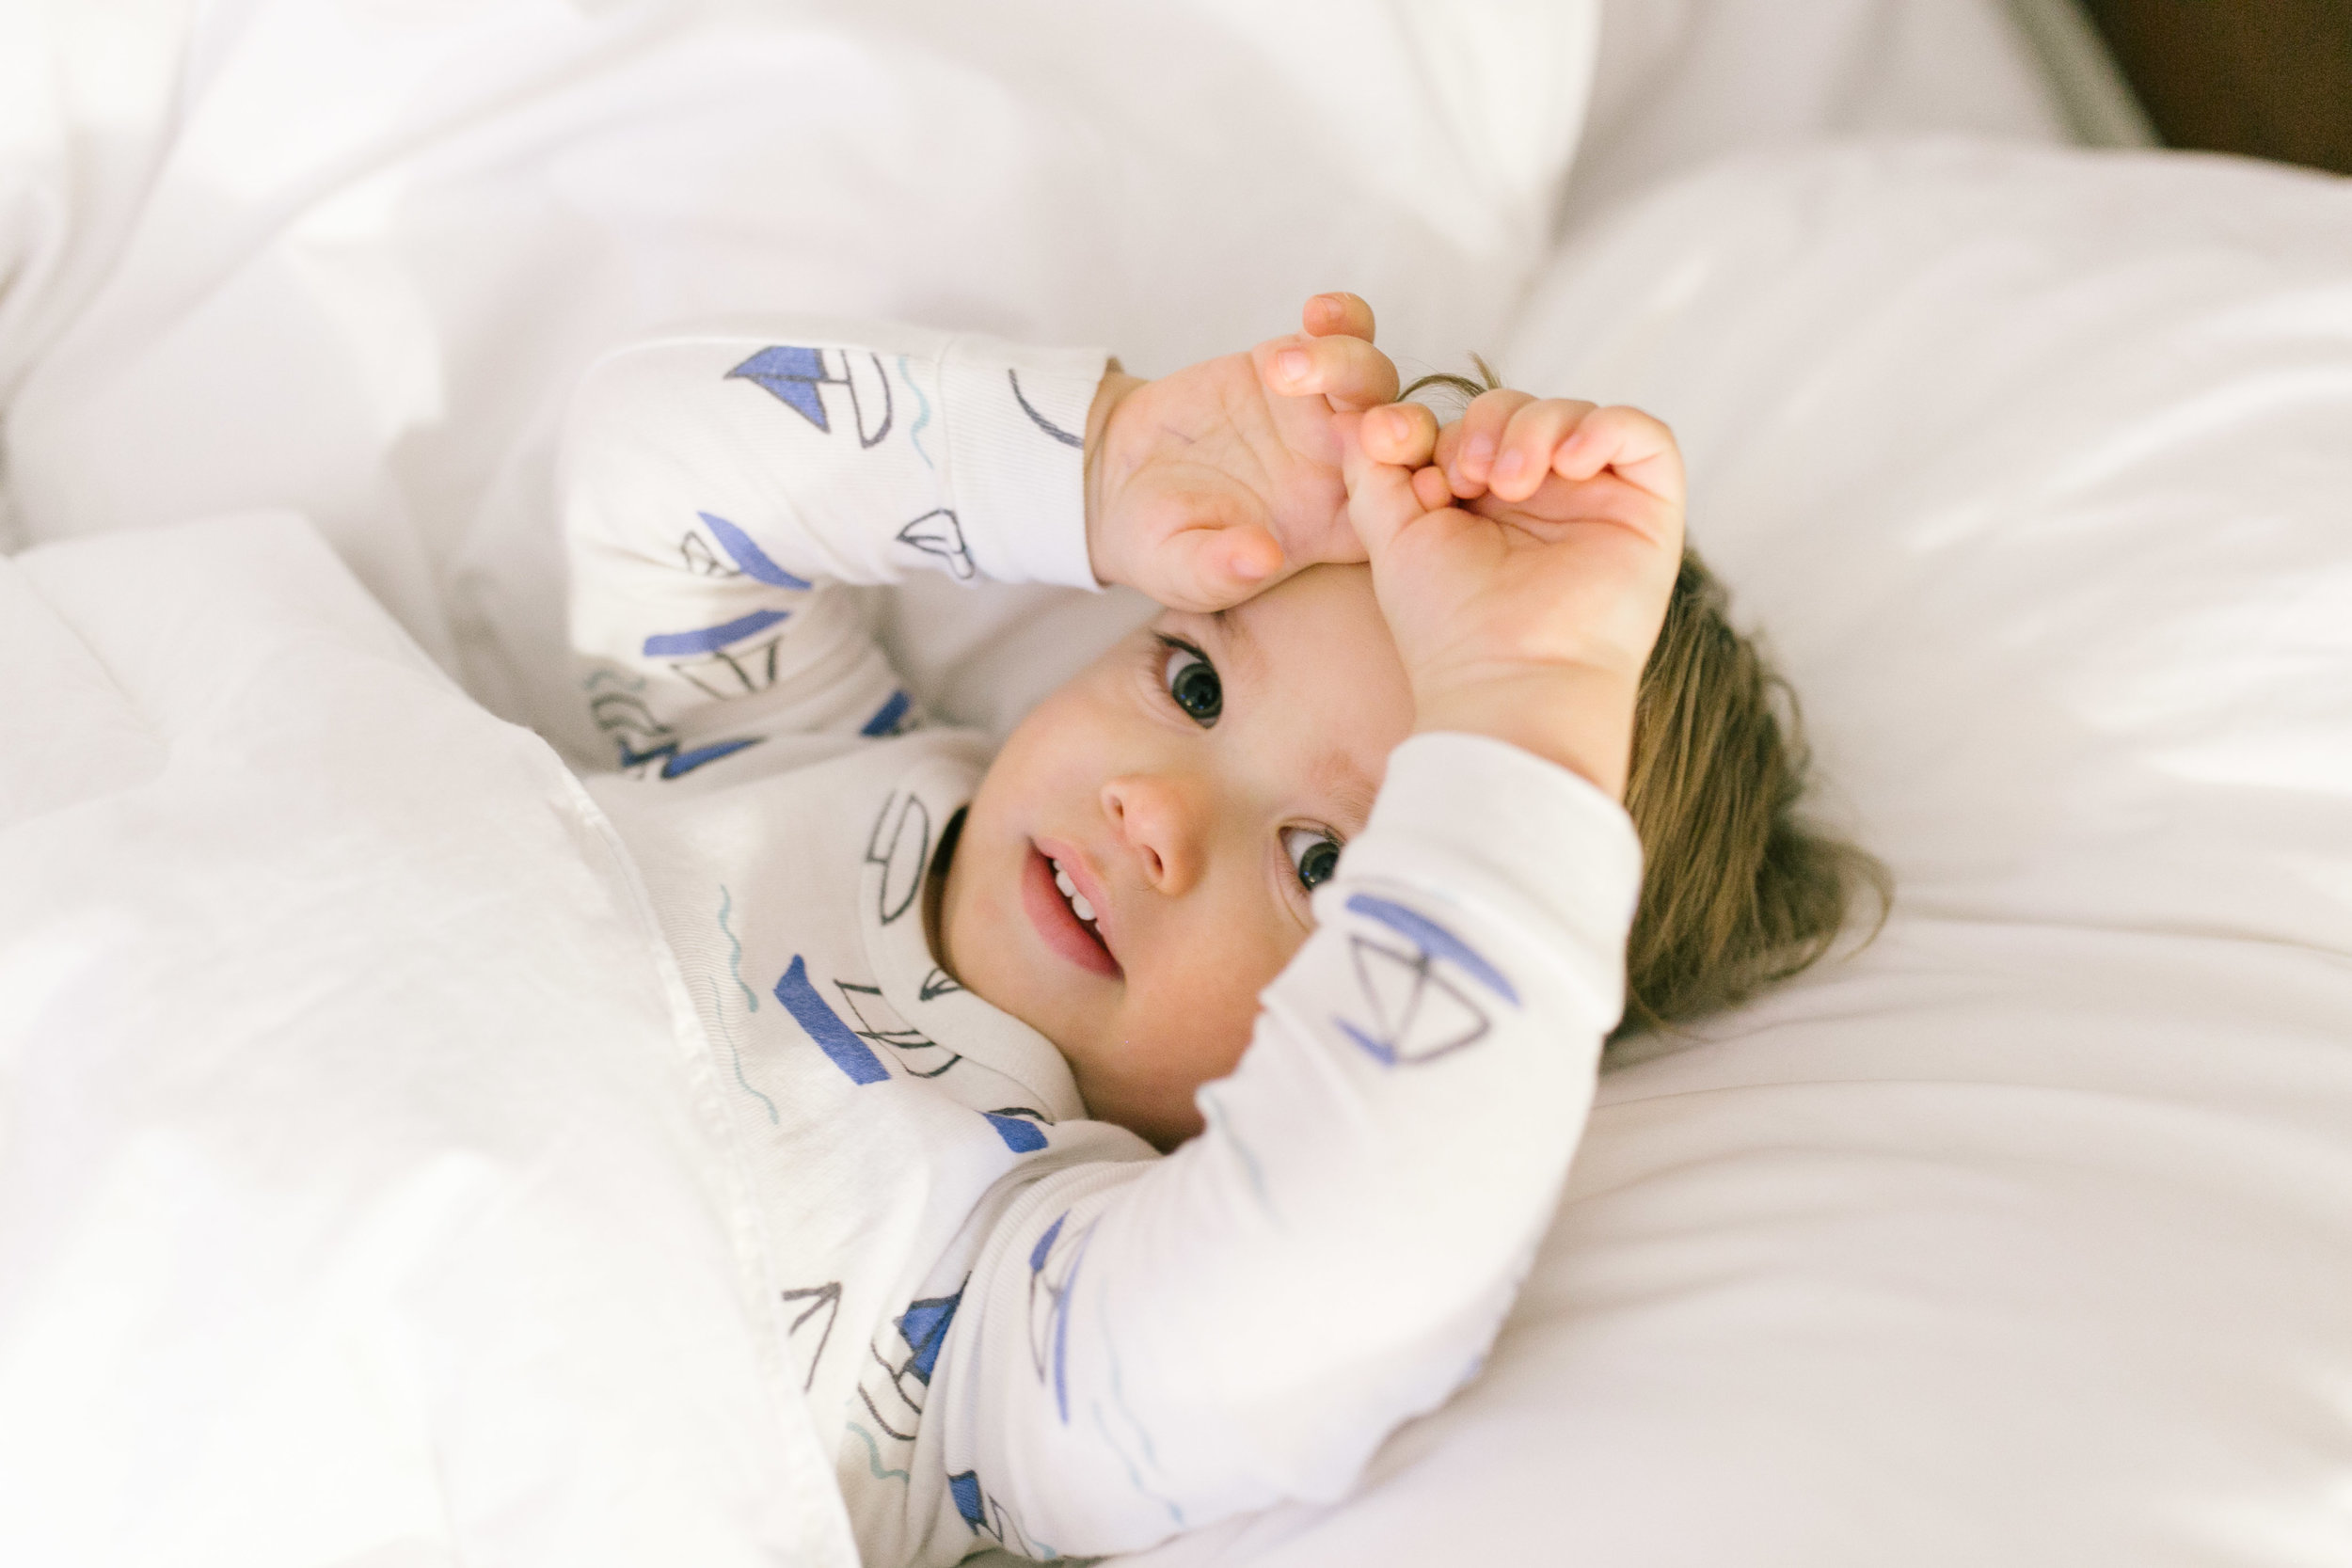 Playful toddler lifestyle portraits, documentary style photography | Chelsea Macor Photography-3.jpg